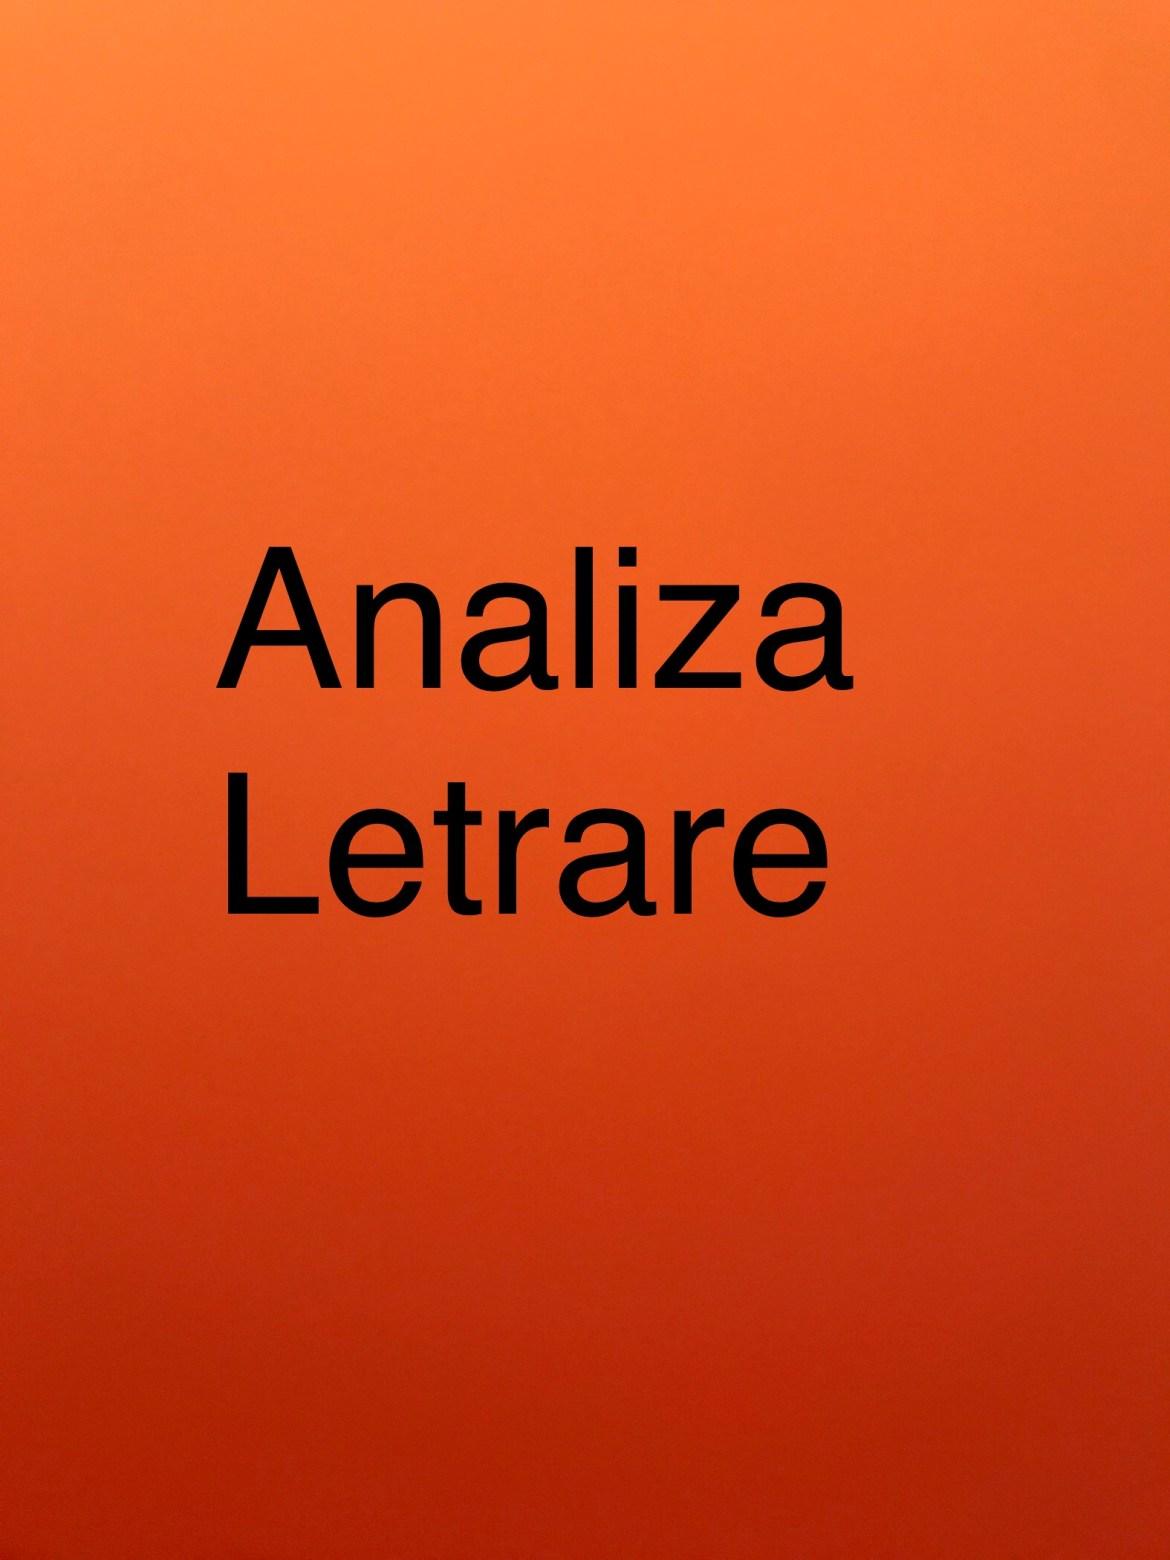 Analiza letrare, Analizë , Analiza të veprave letrare